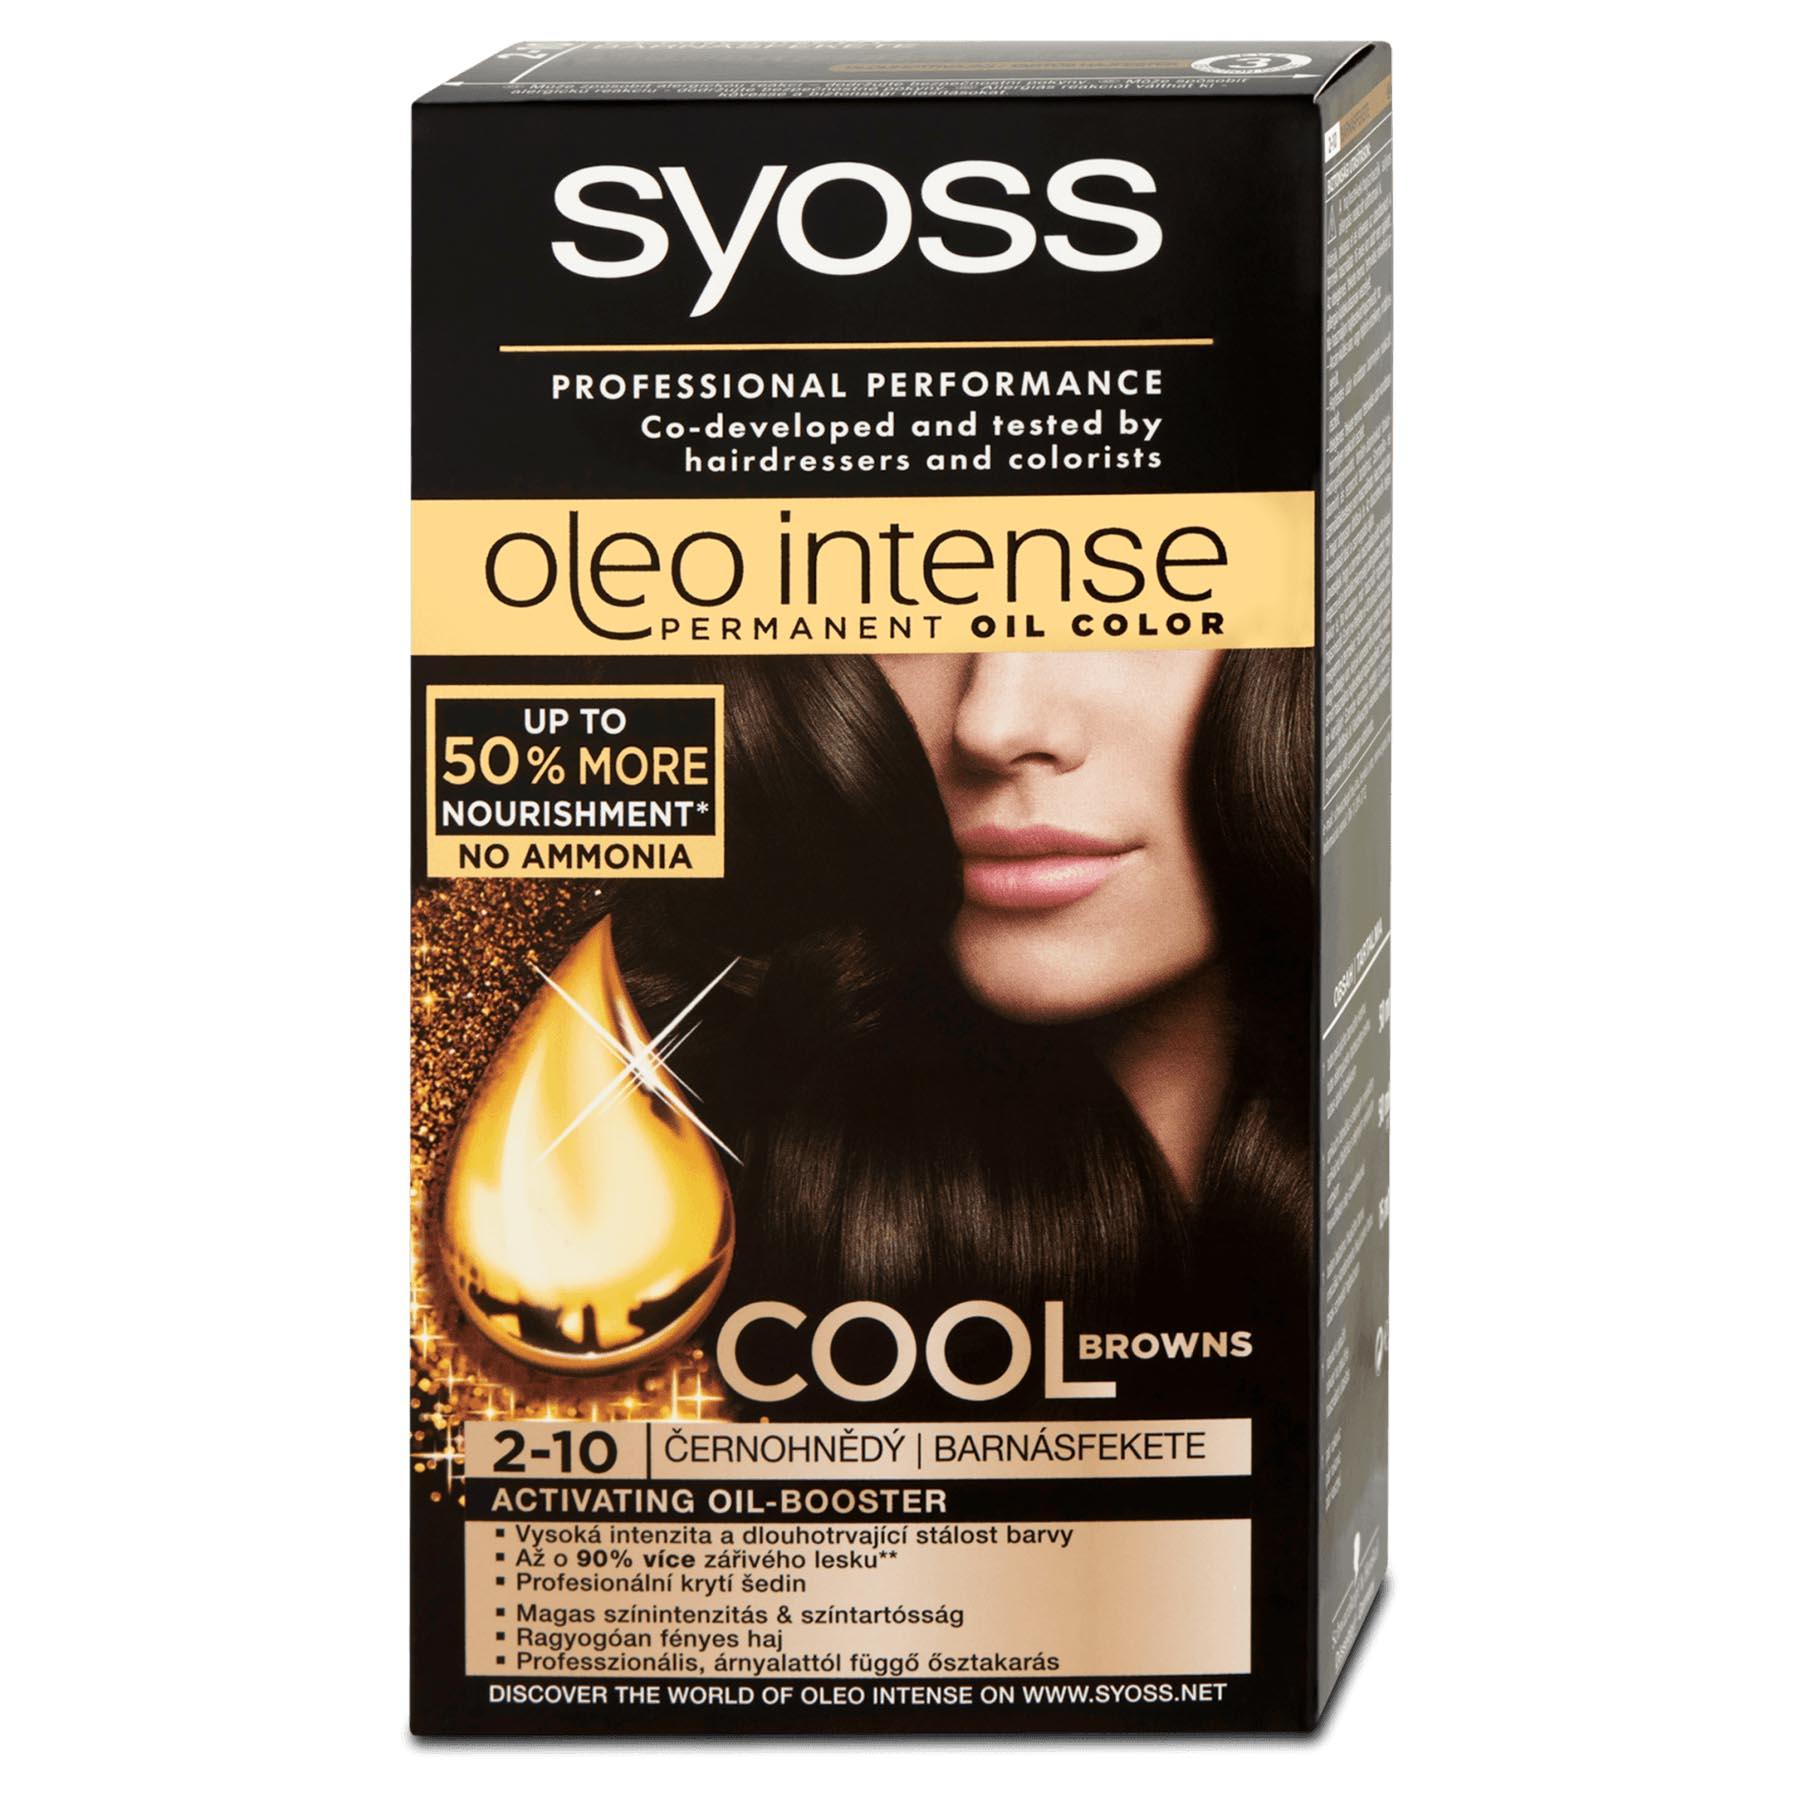 Syoss Oleo Intense Permanent 2-10 Black Brown Hair Oil Color ... 39b8ccda5d8